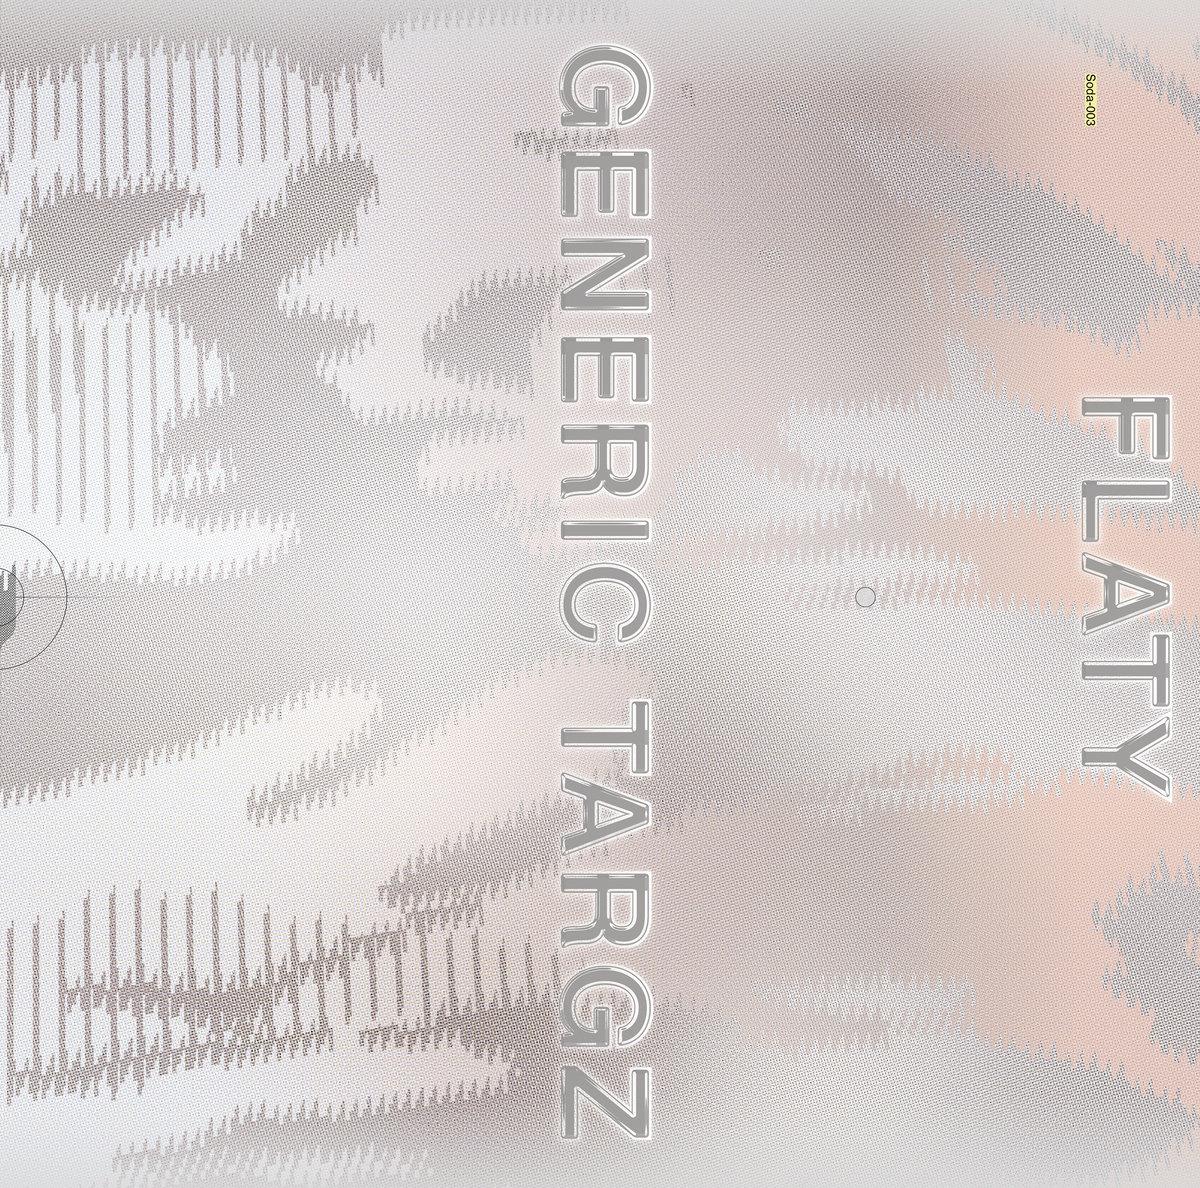 Generic TARGZ